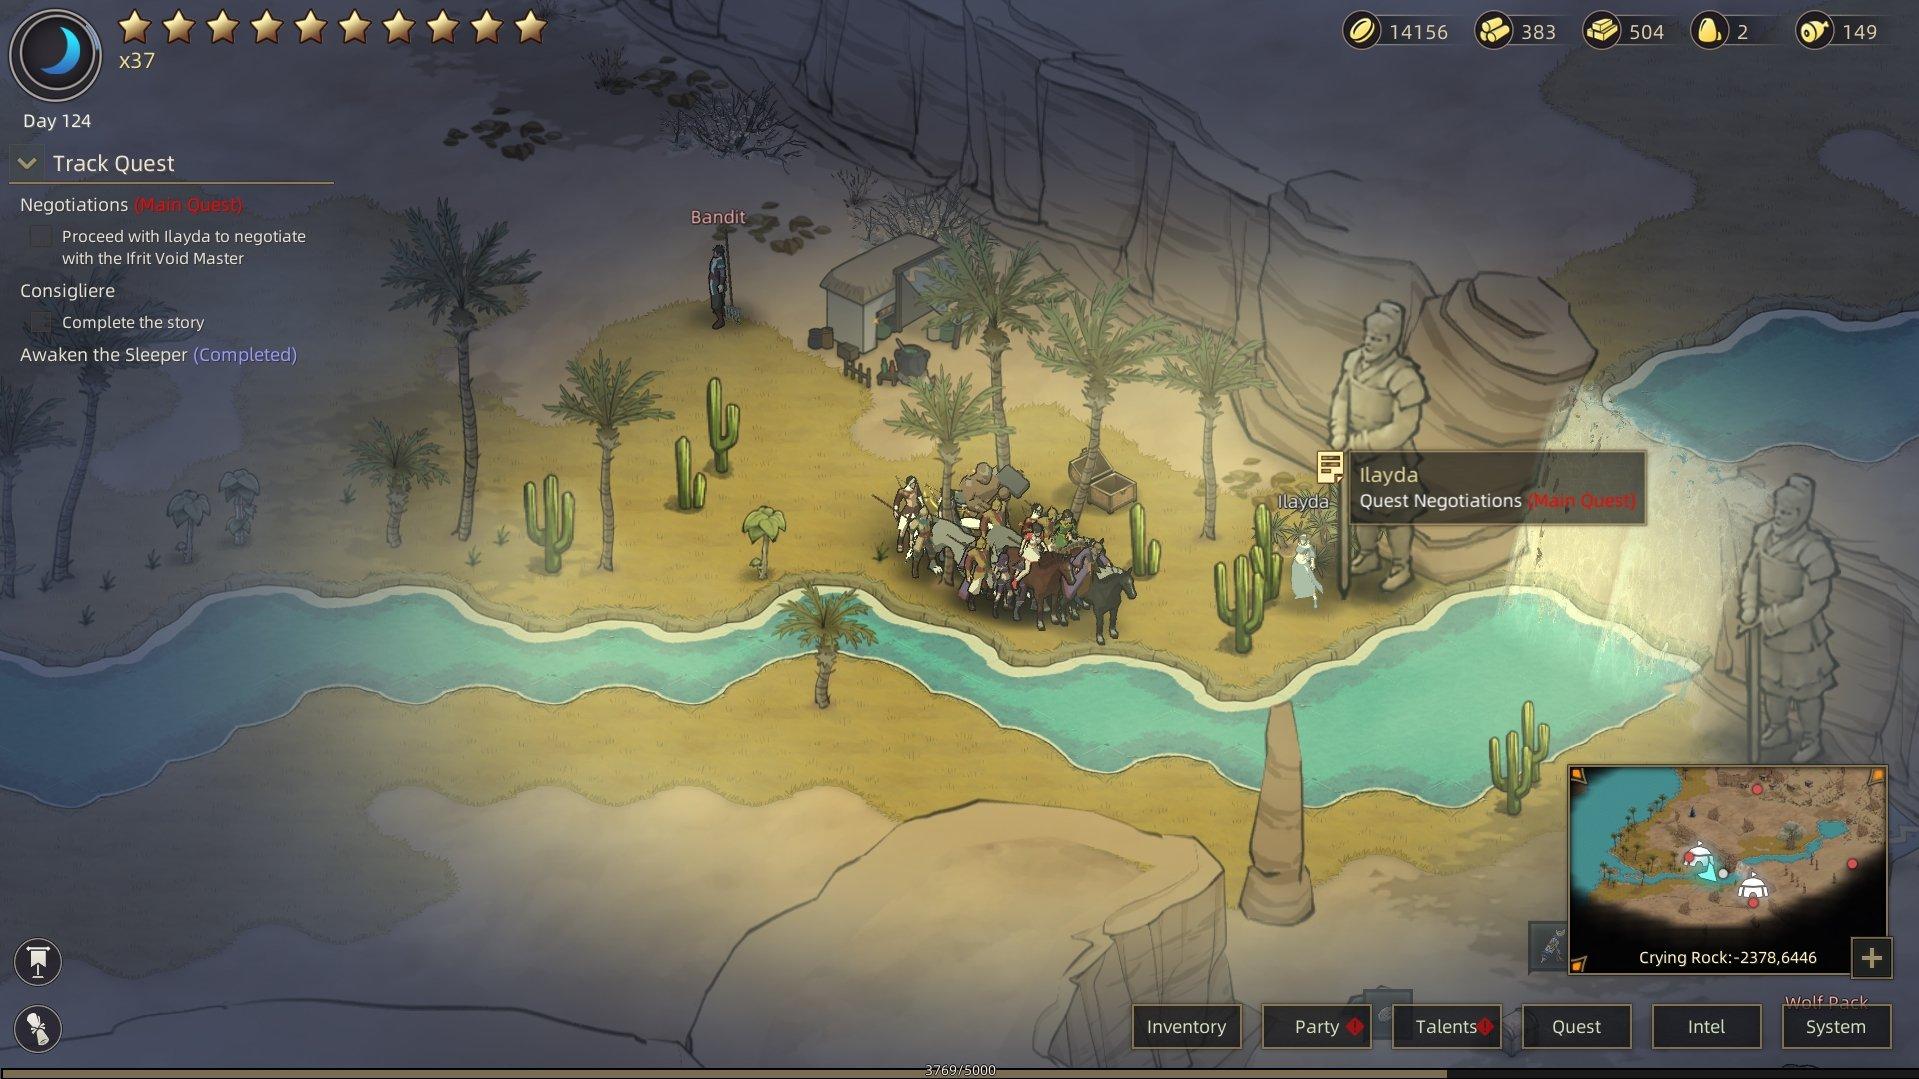 Sands of Salzaar - Negotiations Walkthrough